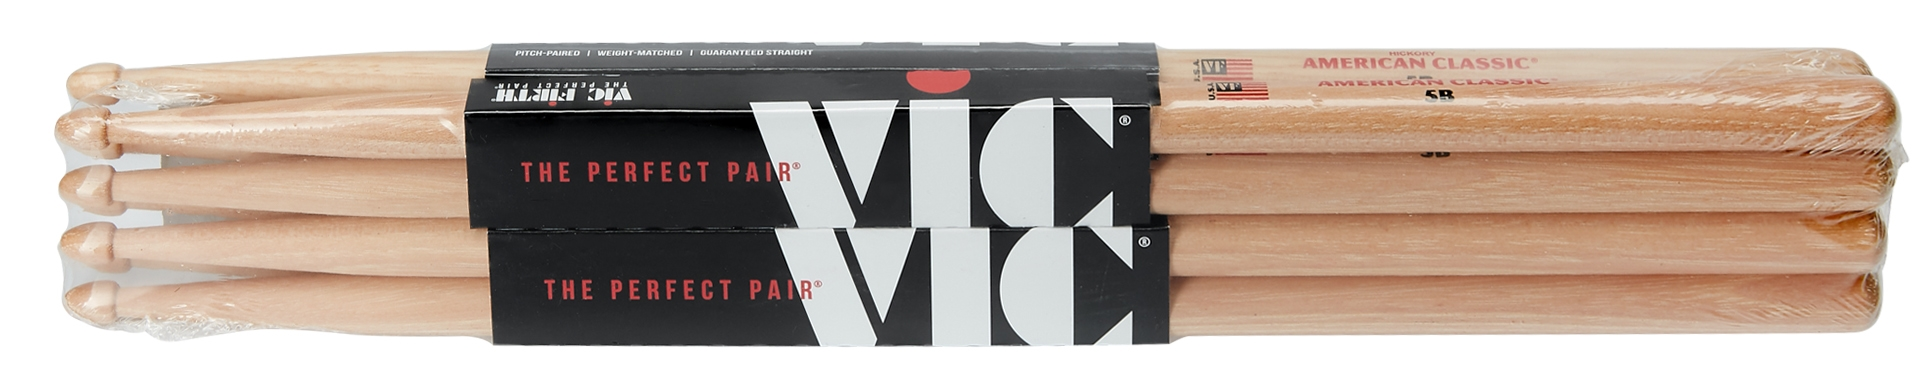 VIC FIRTH 5B 4 Pack